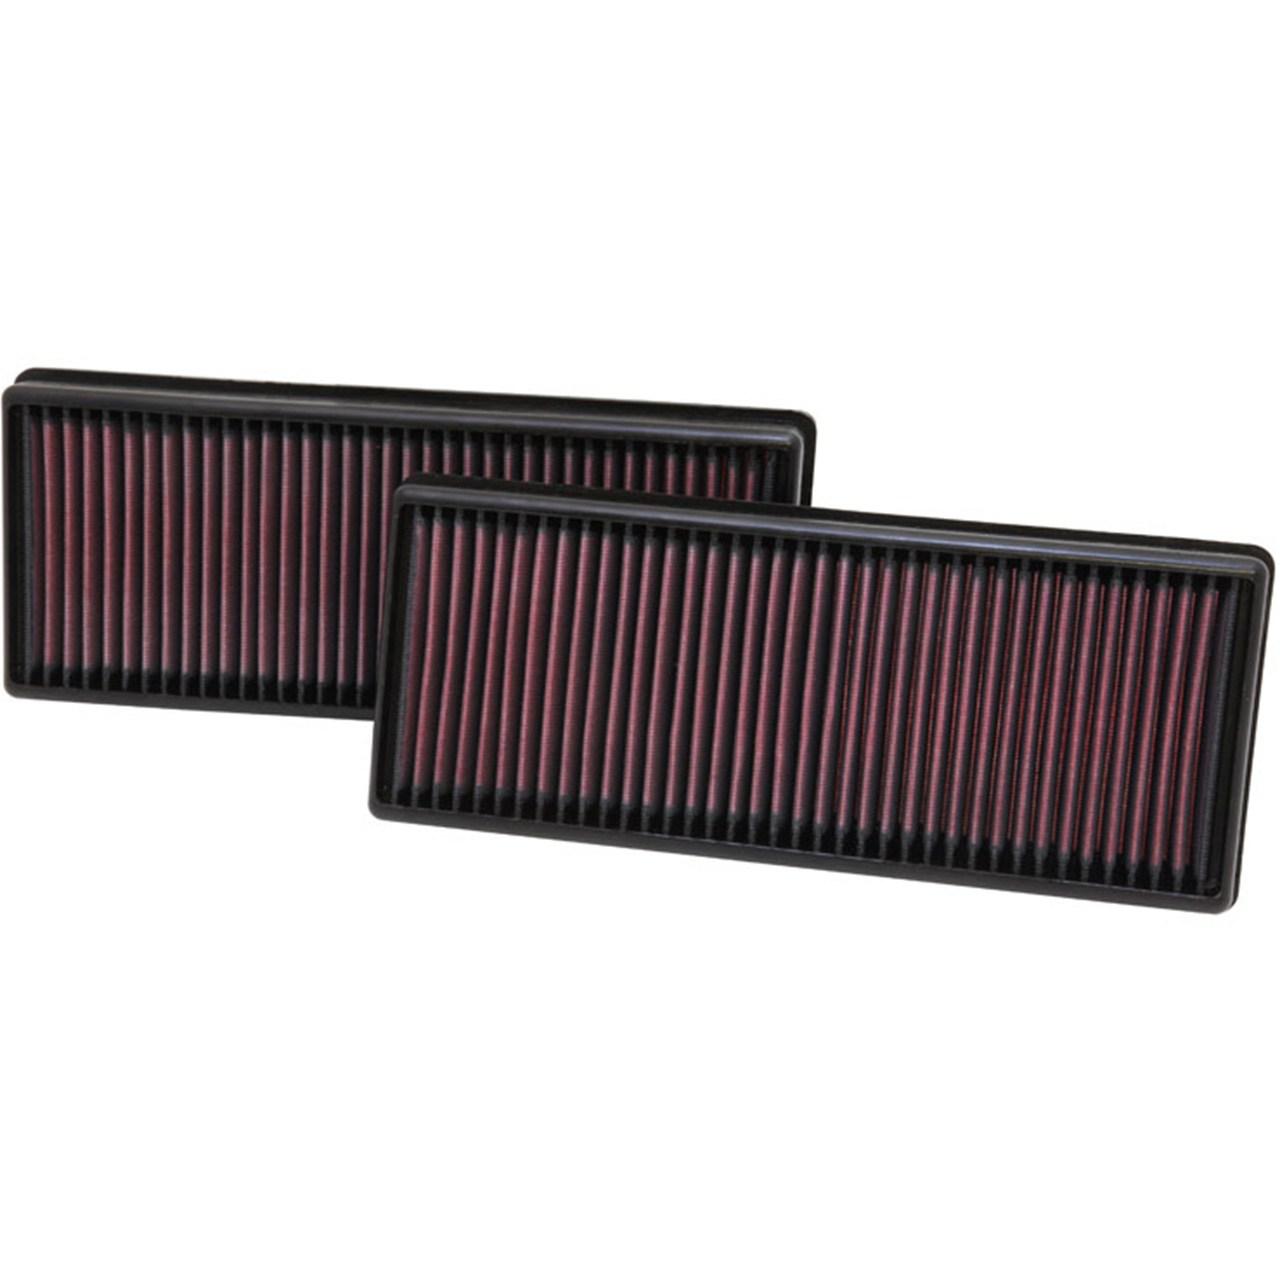 فیلتر هوای خودروی کی اند ان مدل 2474-33